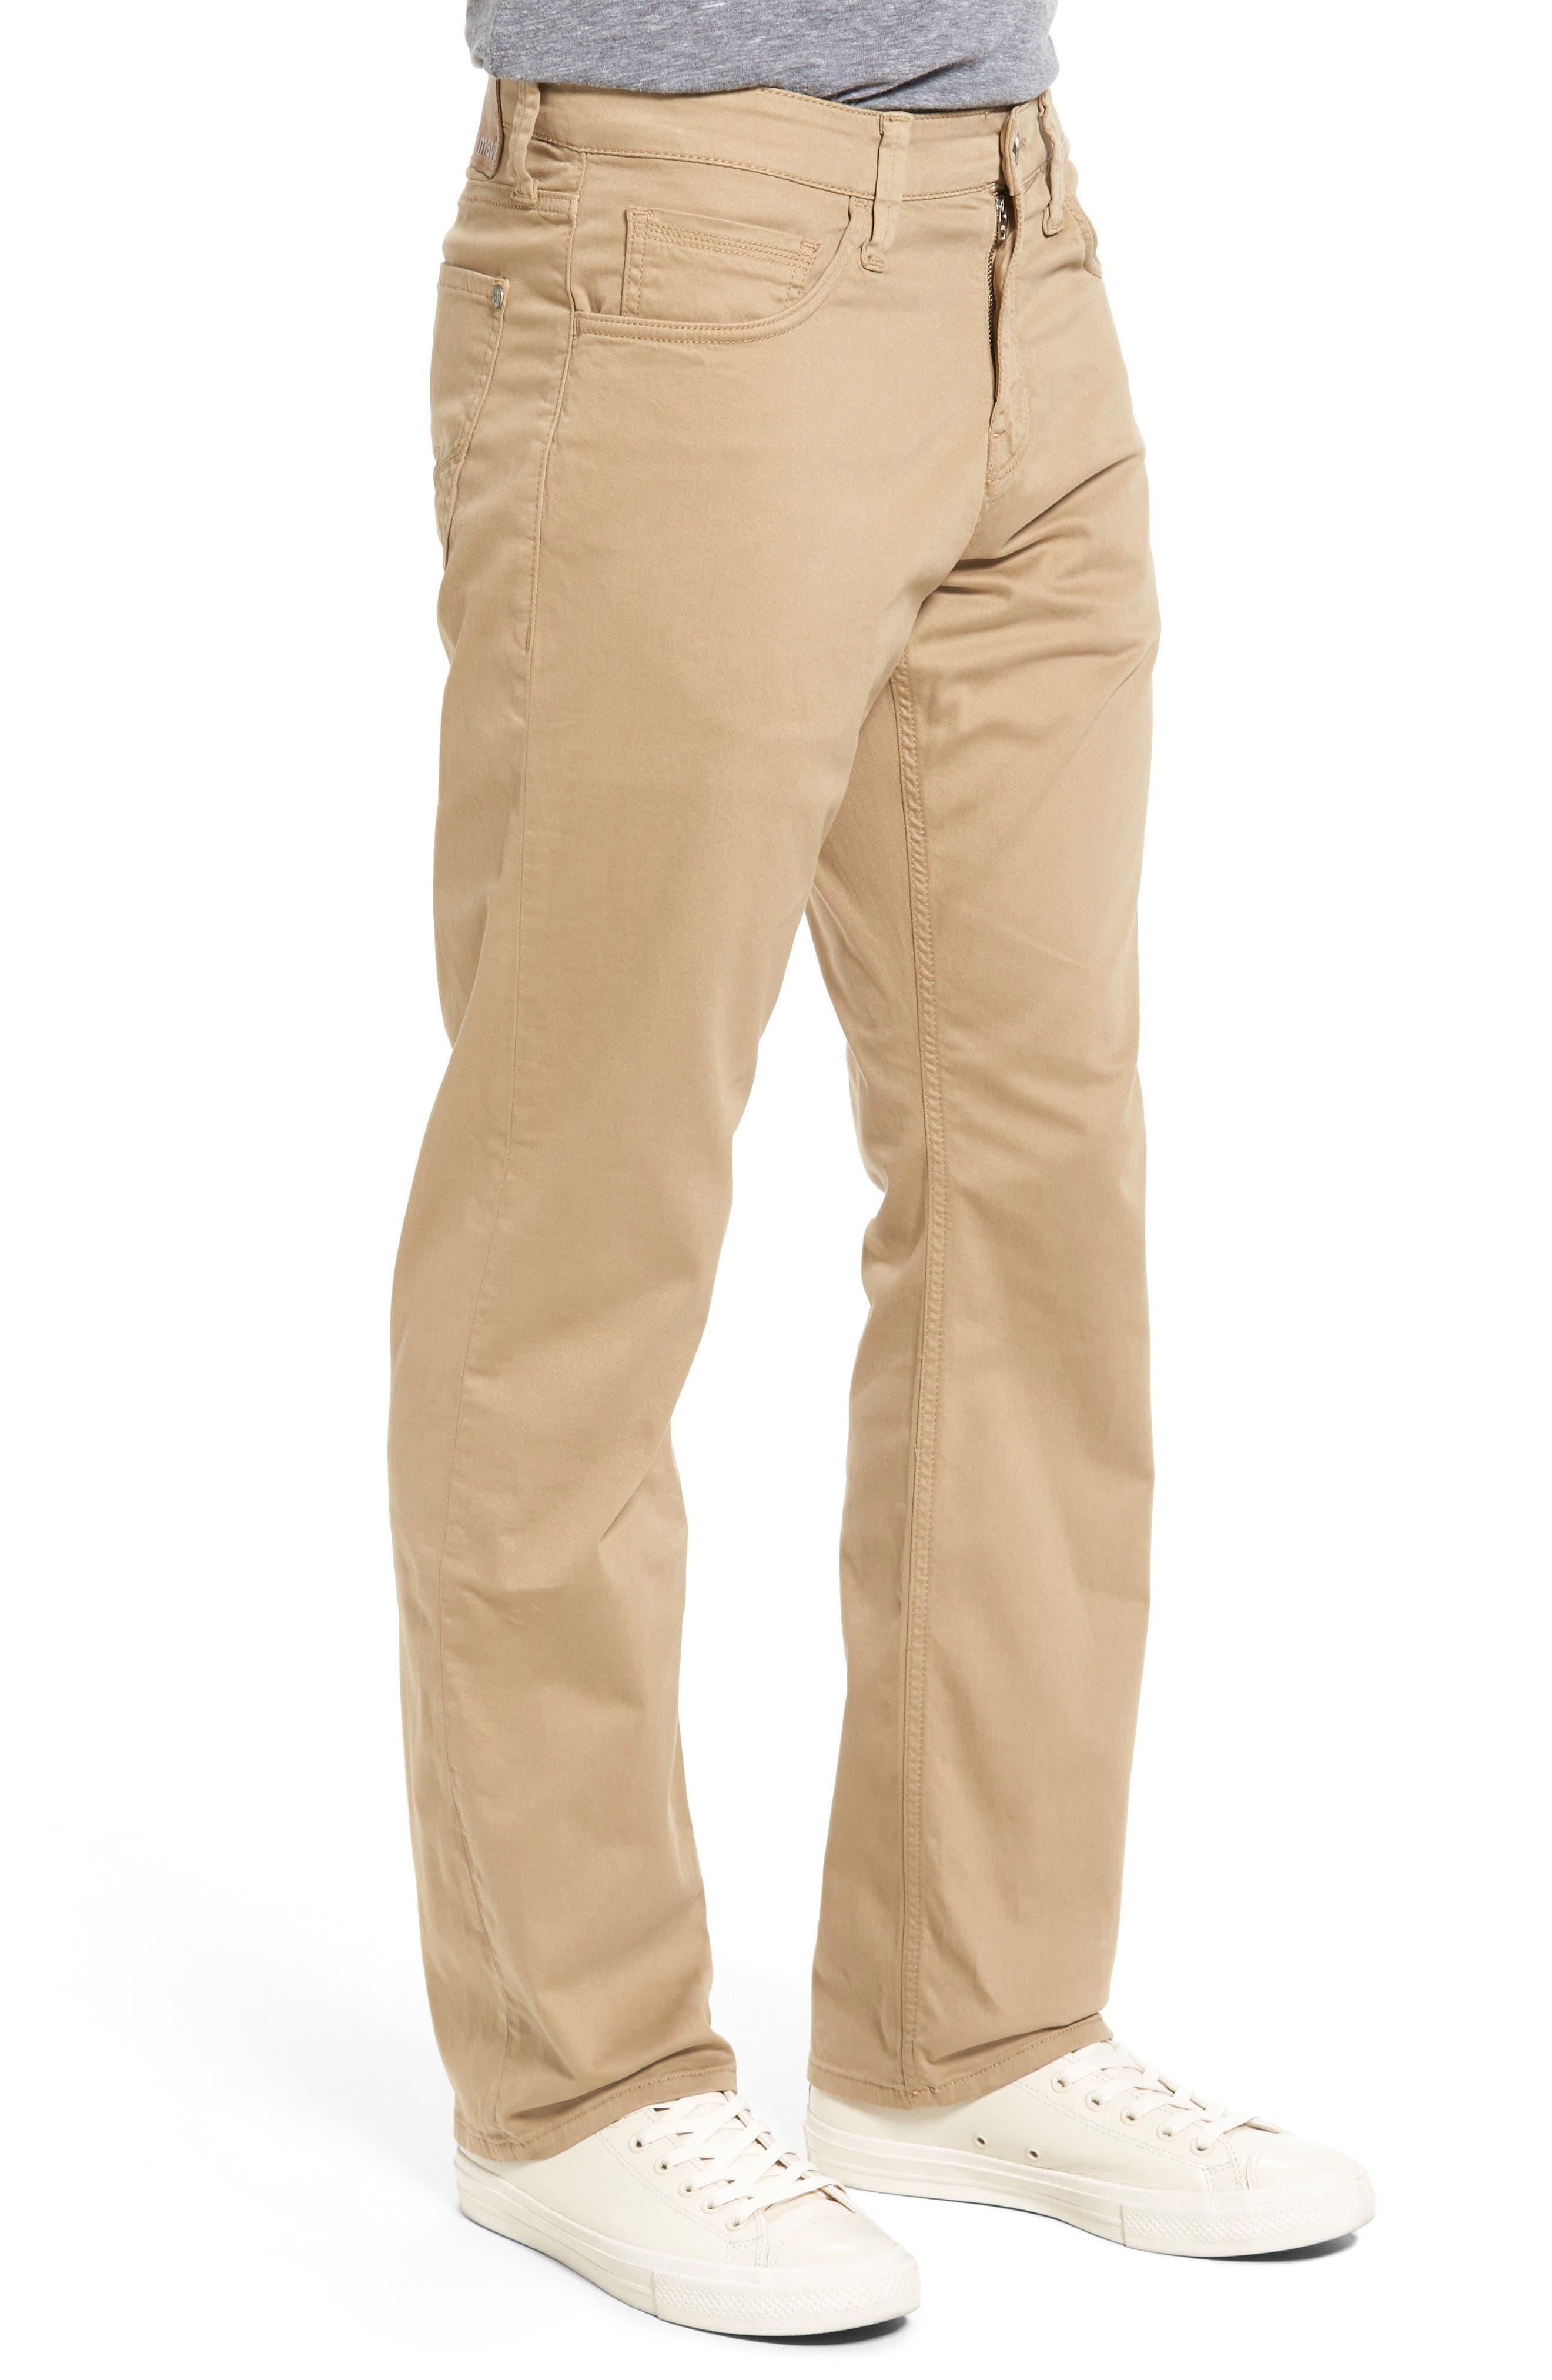 Matt Relaxed Fit Jeans,                             Alternate thumbnail 3, color,                             British Khaki Twill